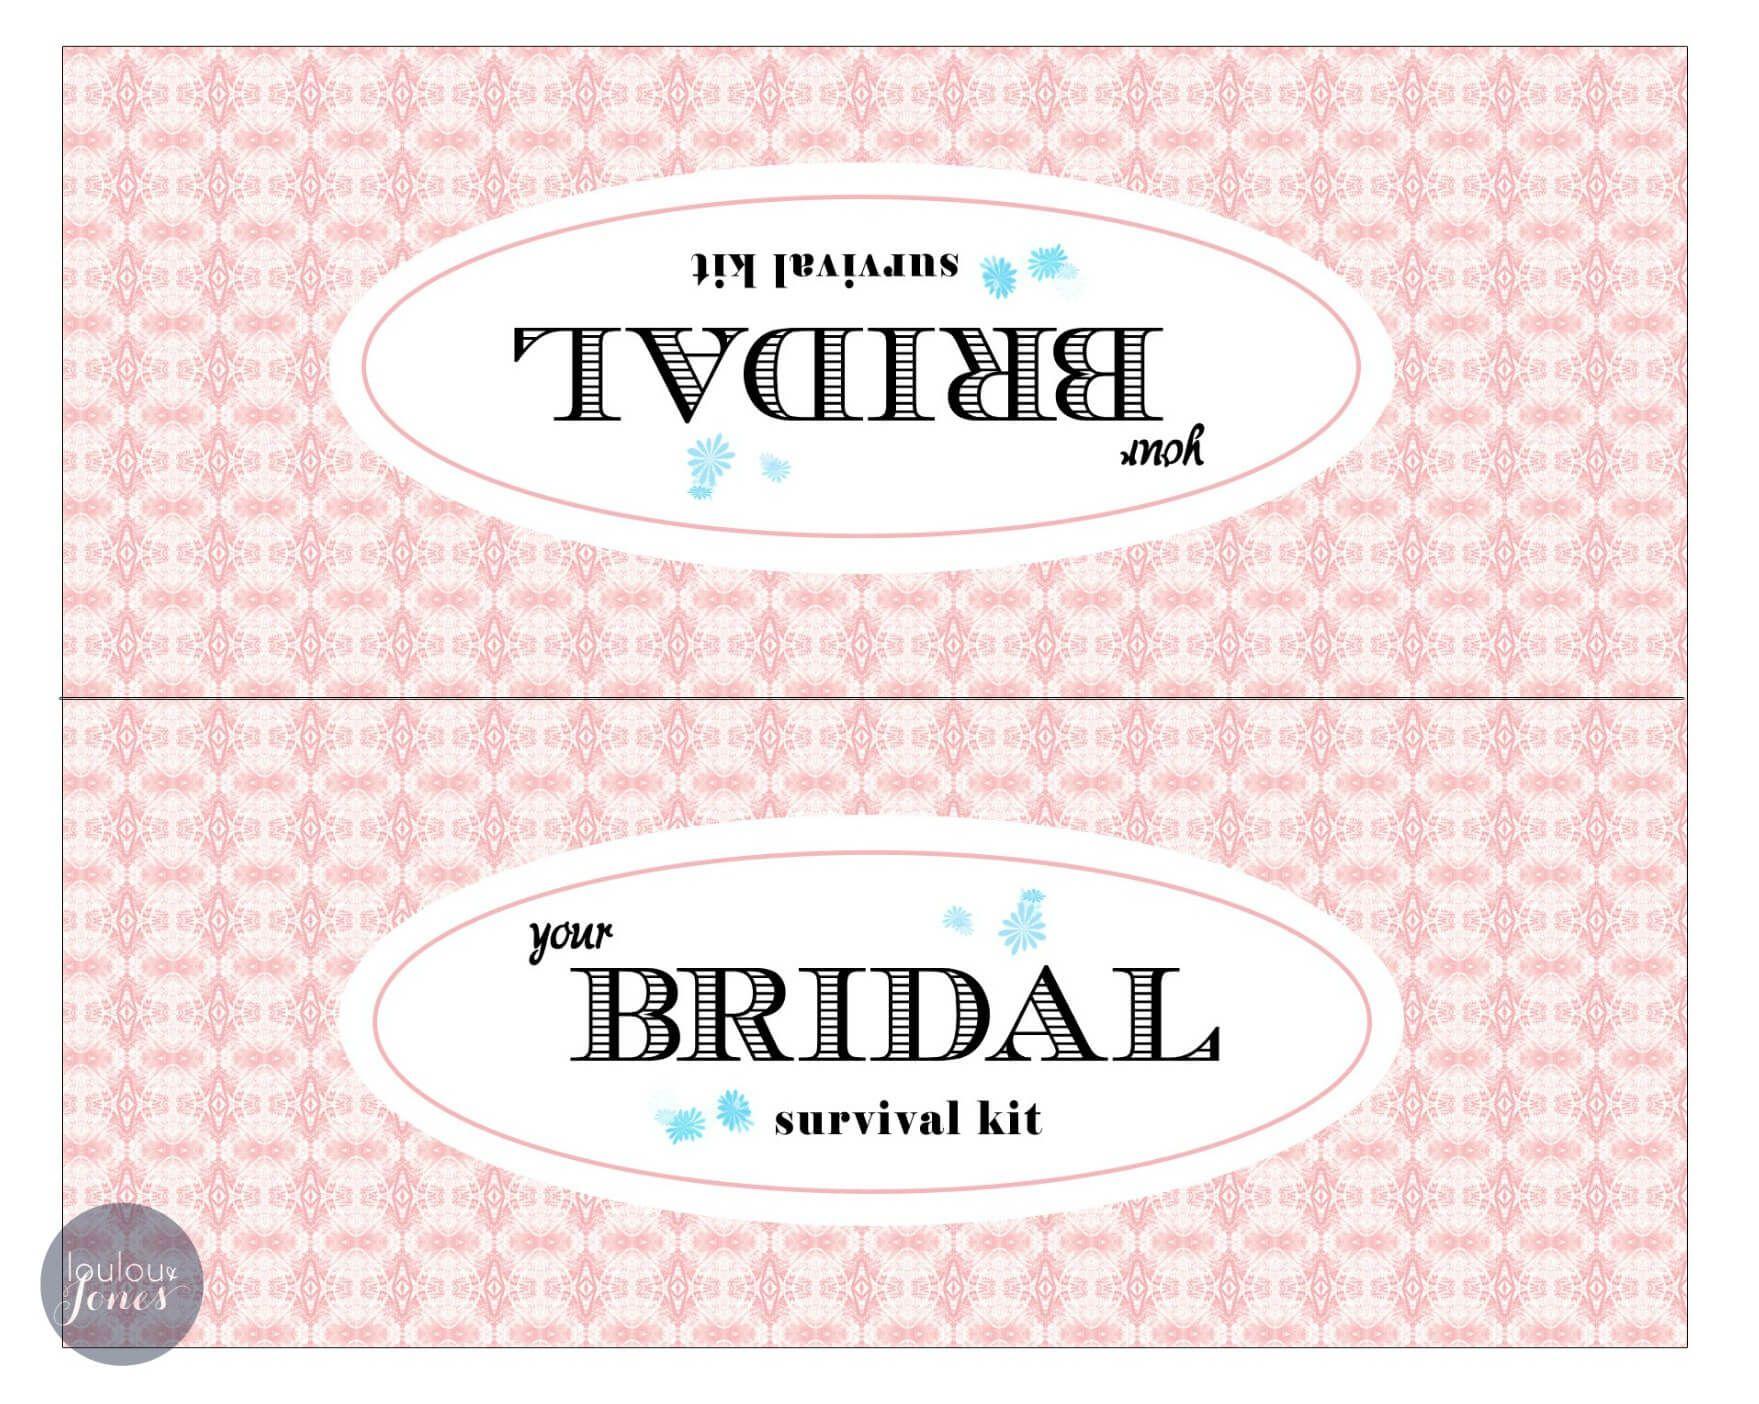 Bridal Survival Kit Free Printable